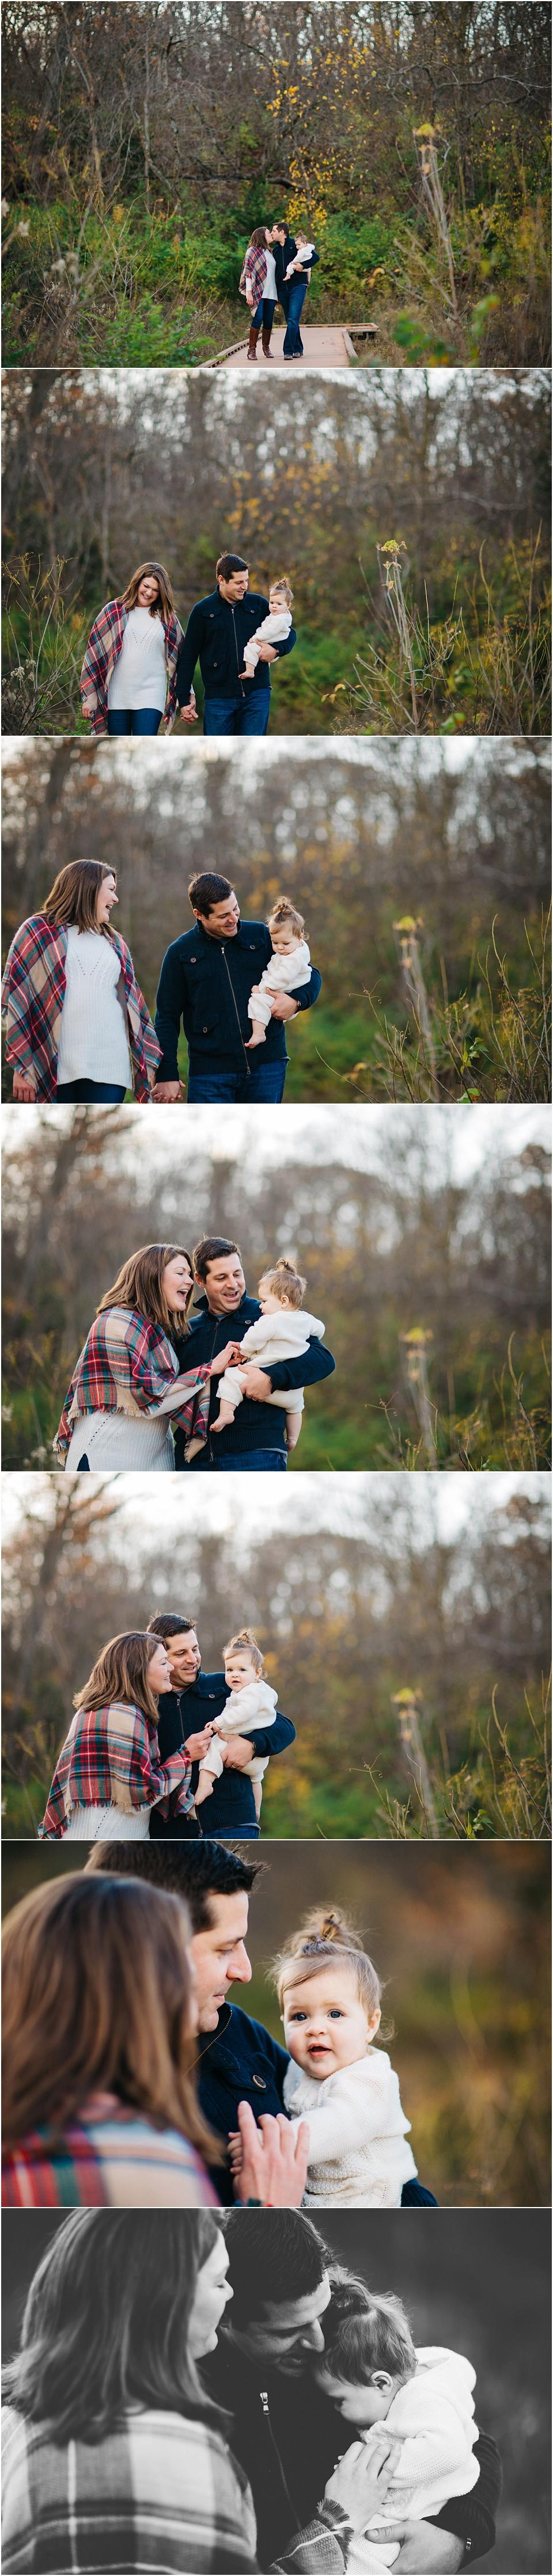 kansascityfamilyphotographer_2011